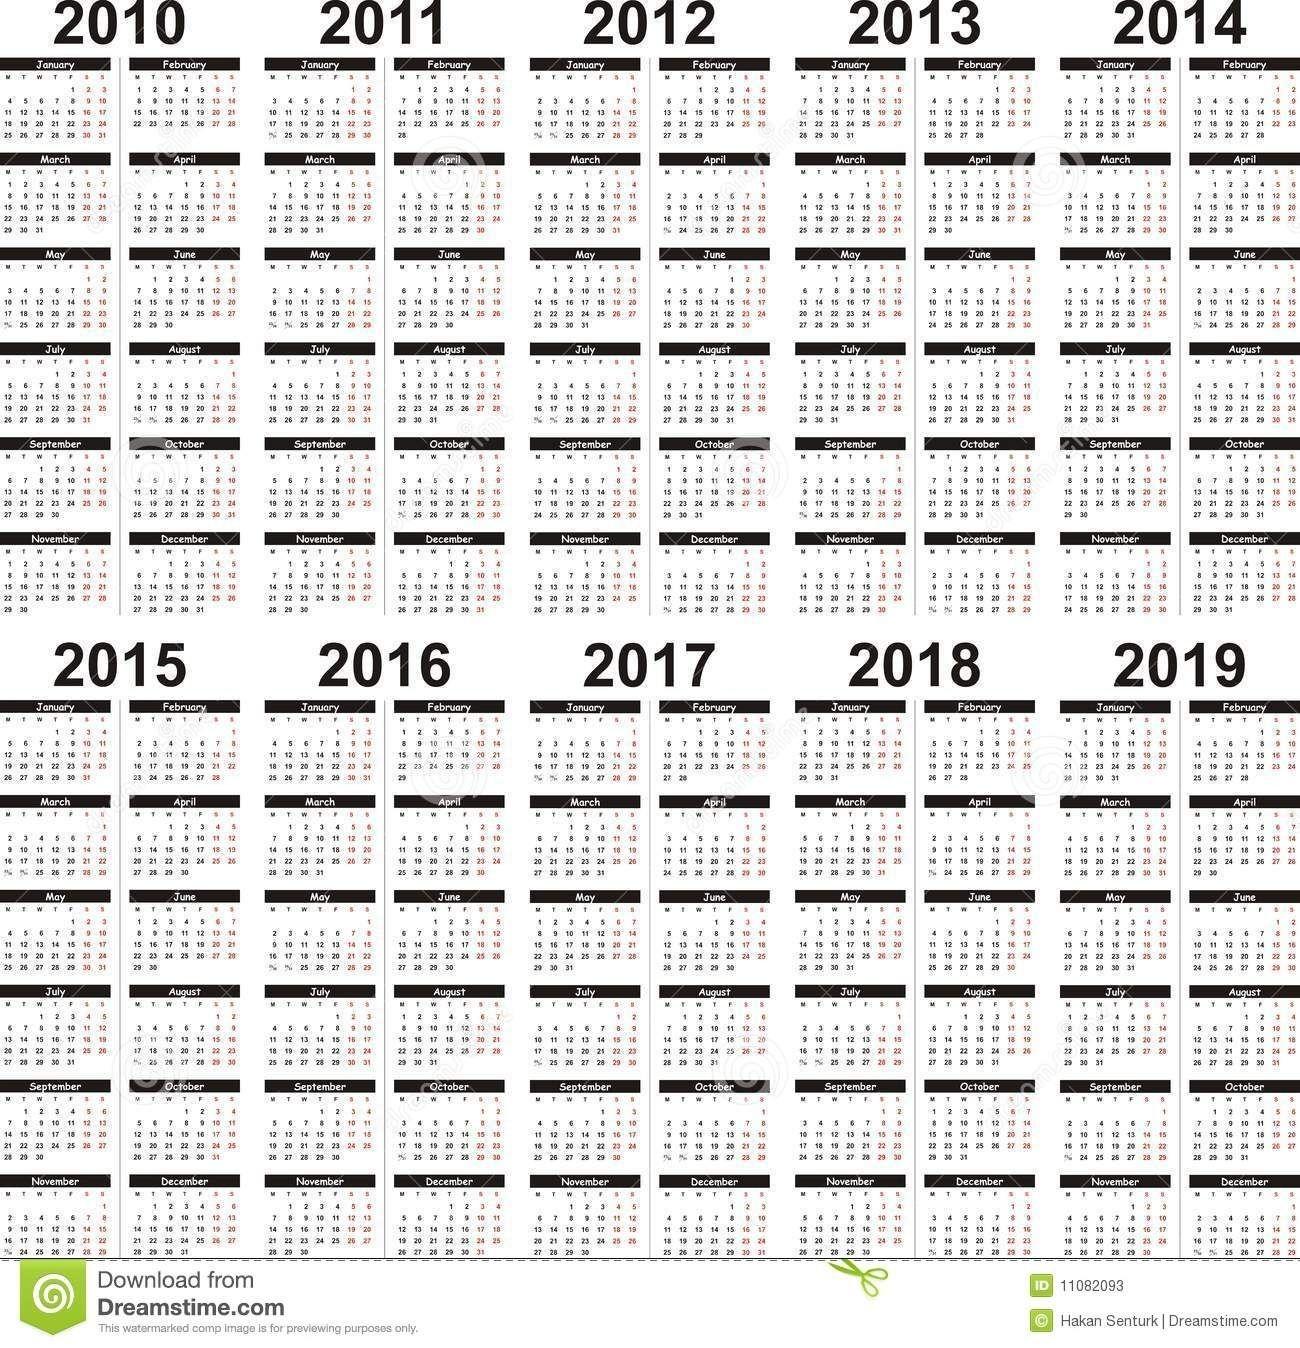 5 Year Calendar (With Images)   5 Year Calendar, Calendar